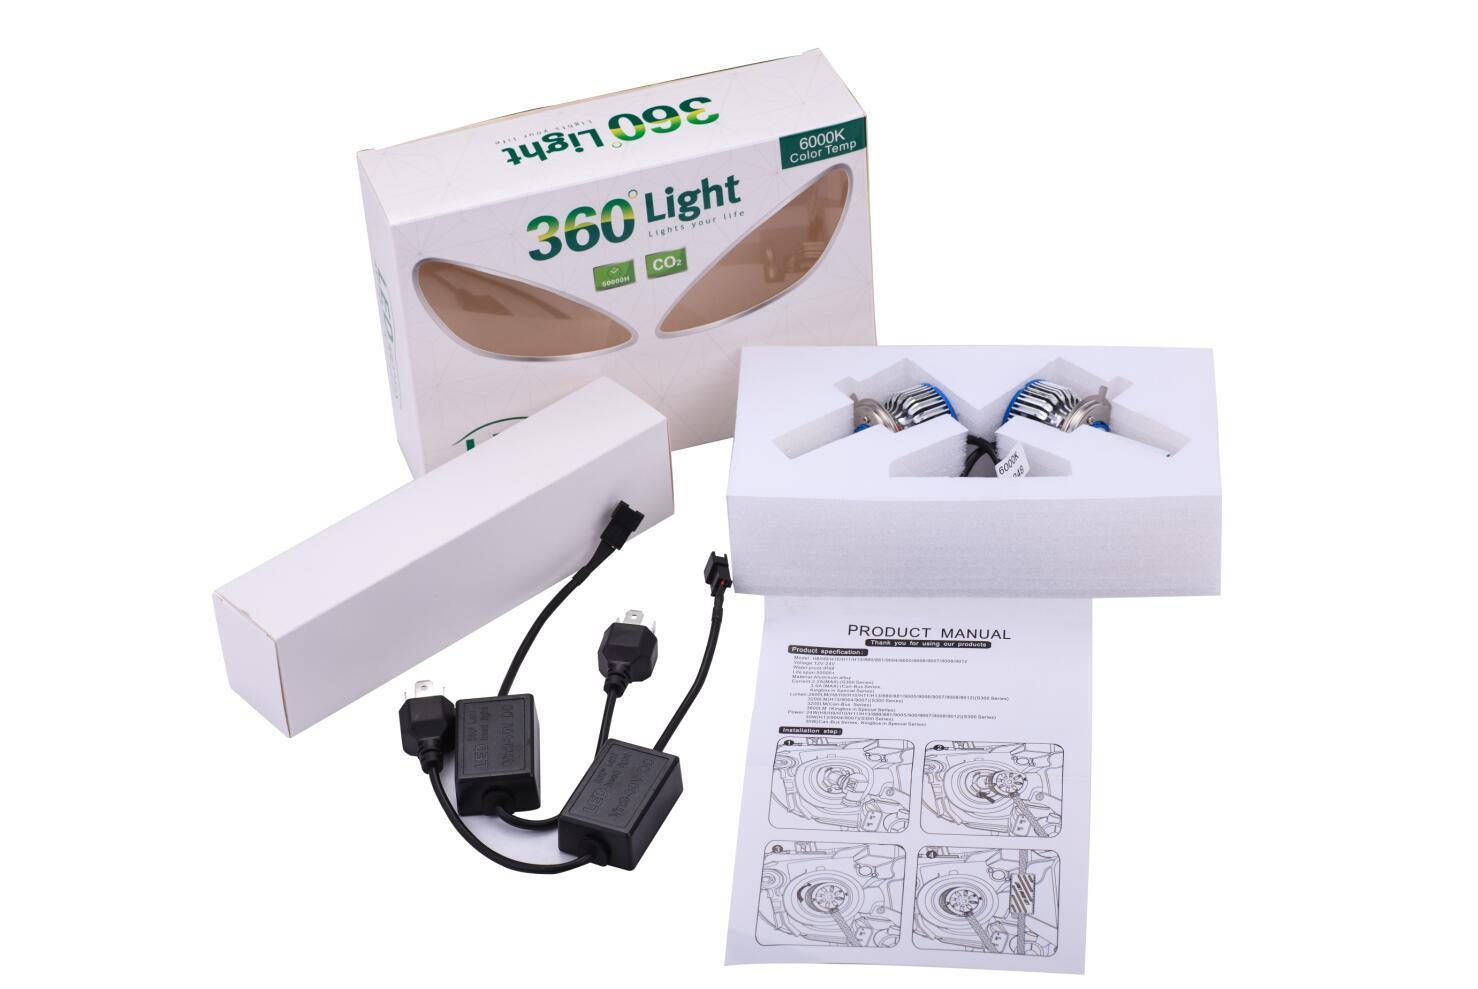 Super Bright 4500lm COB H1, H3, H4, H7, H11, 9005, 9006, 9012, D1s, D2s, D3s, D4s Car LED Headlight